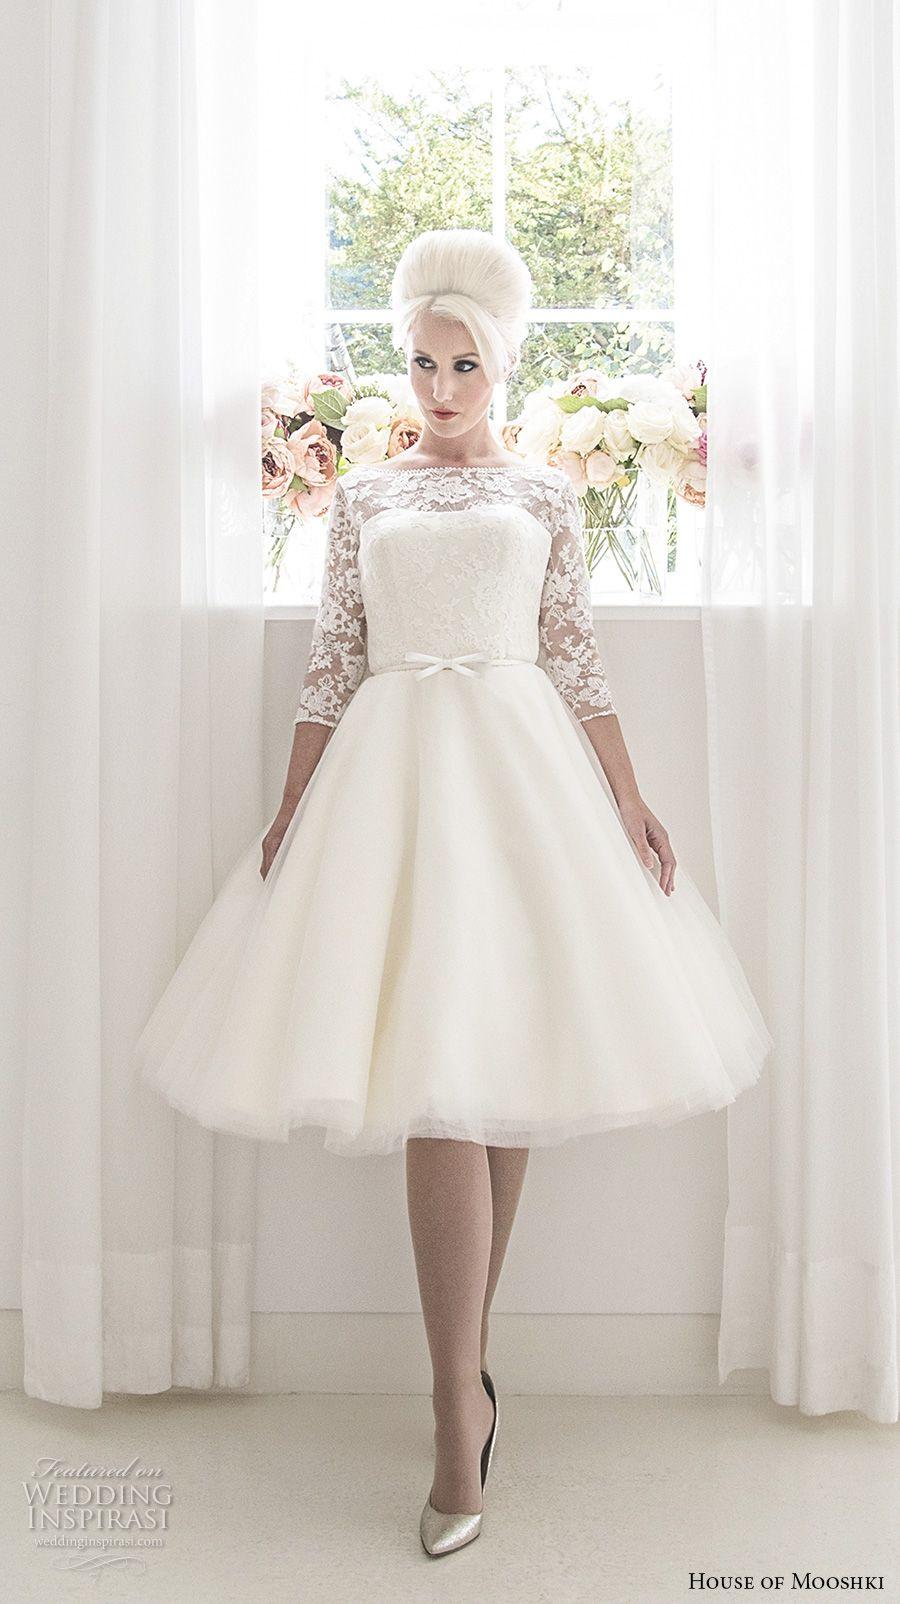 House Of Mooshki 2017 Wedding Dresses Wedding Inspirasi Short Wedding Dress Fluffy Wedding Dress Tea Length Wedding Dress [ 1604 x 900 Pixel ]